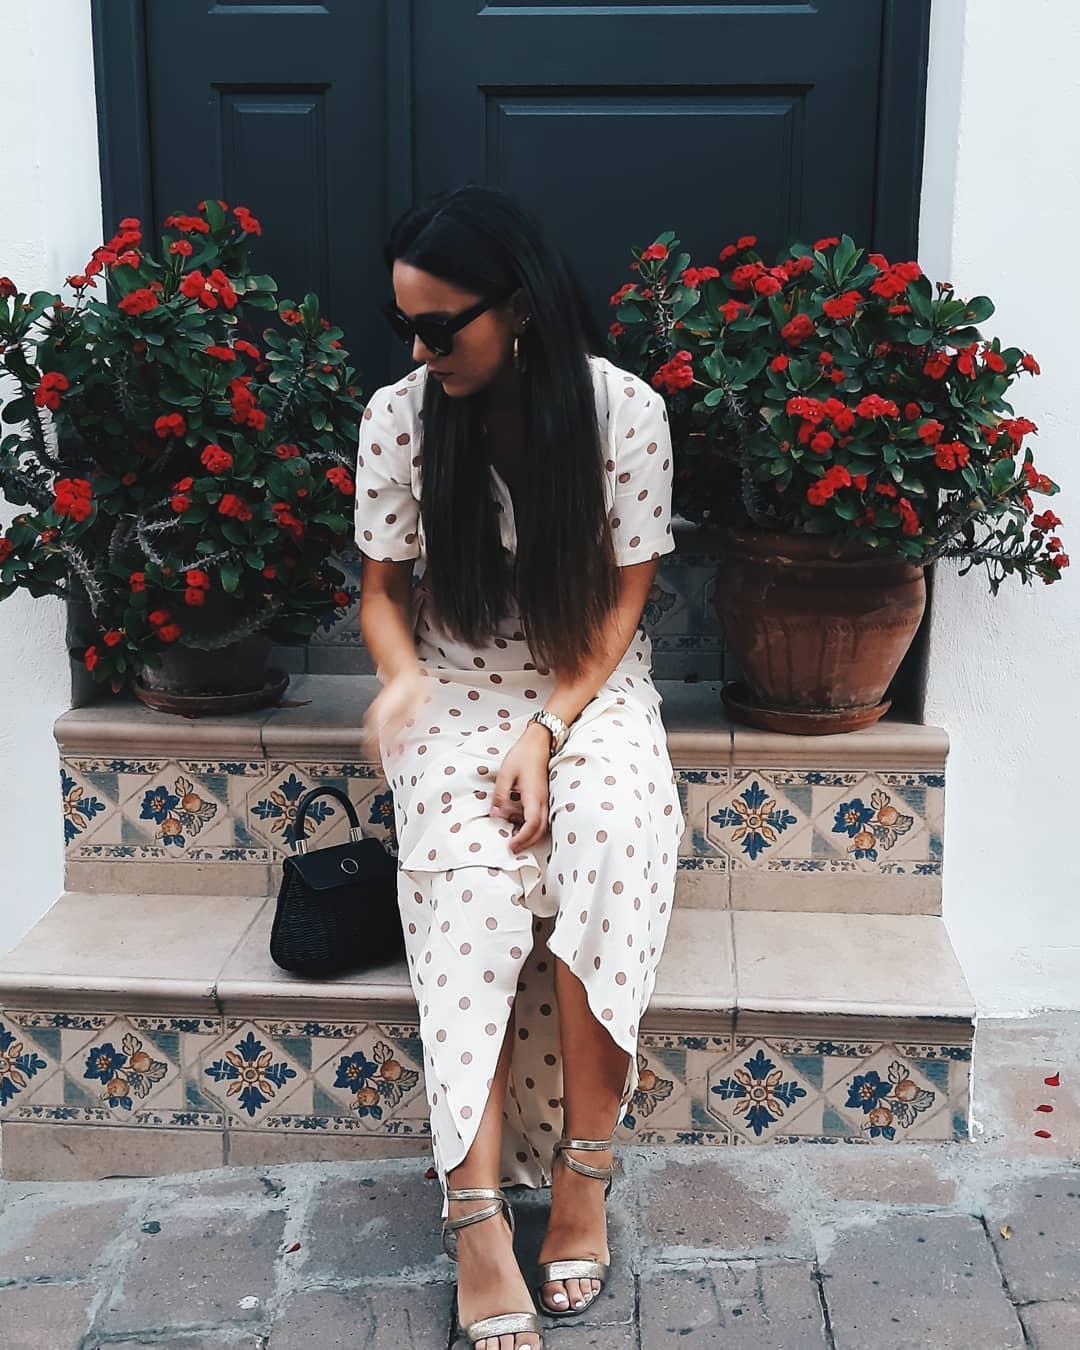 polka dots long dress de Zara sur mariamolina.7